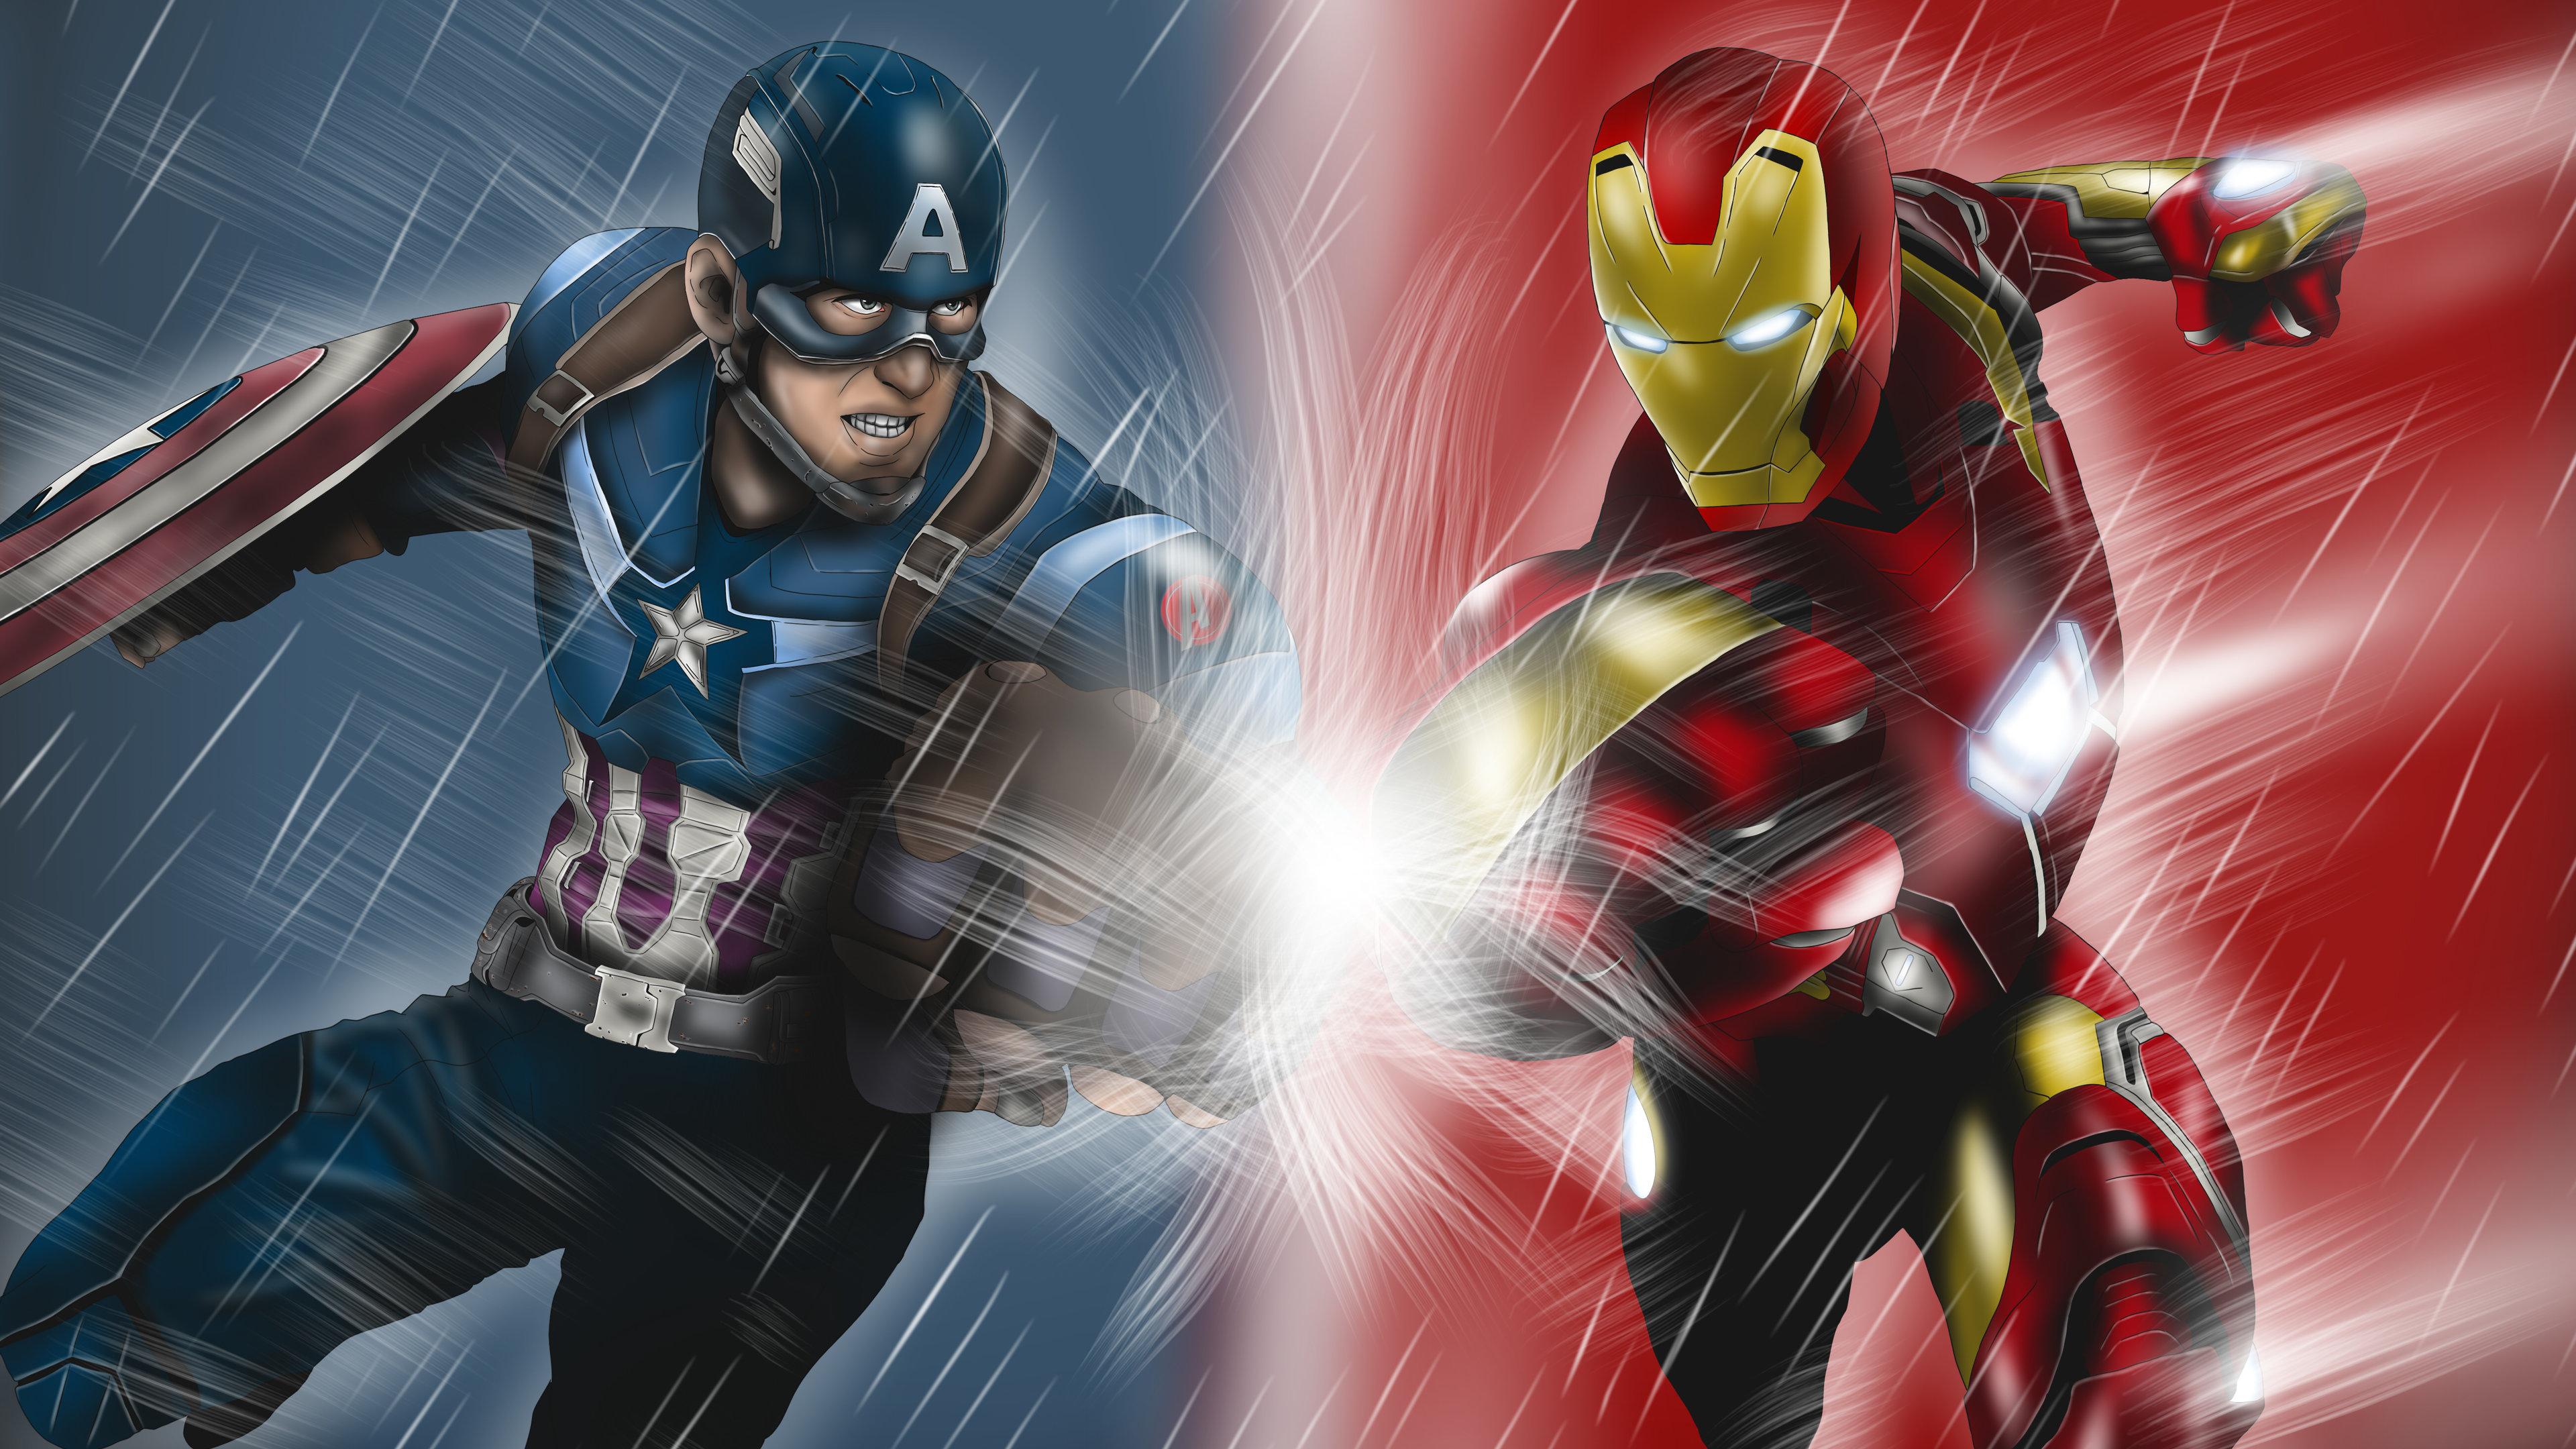 captain america and iron man artwork 5k 1536520360 - Captain America And Iron Man Artwork 5k - iron man wallpapers, hd-wallpapers, deviantart wallpapers, captain america wallpapers, artwork wallpapers, artist wallpapers, 5k wallpapers, 4k-wallpapers